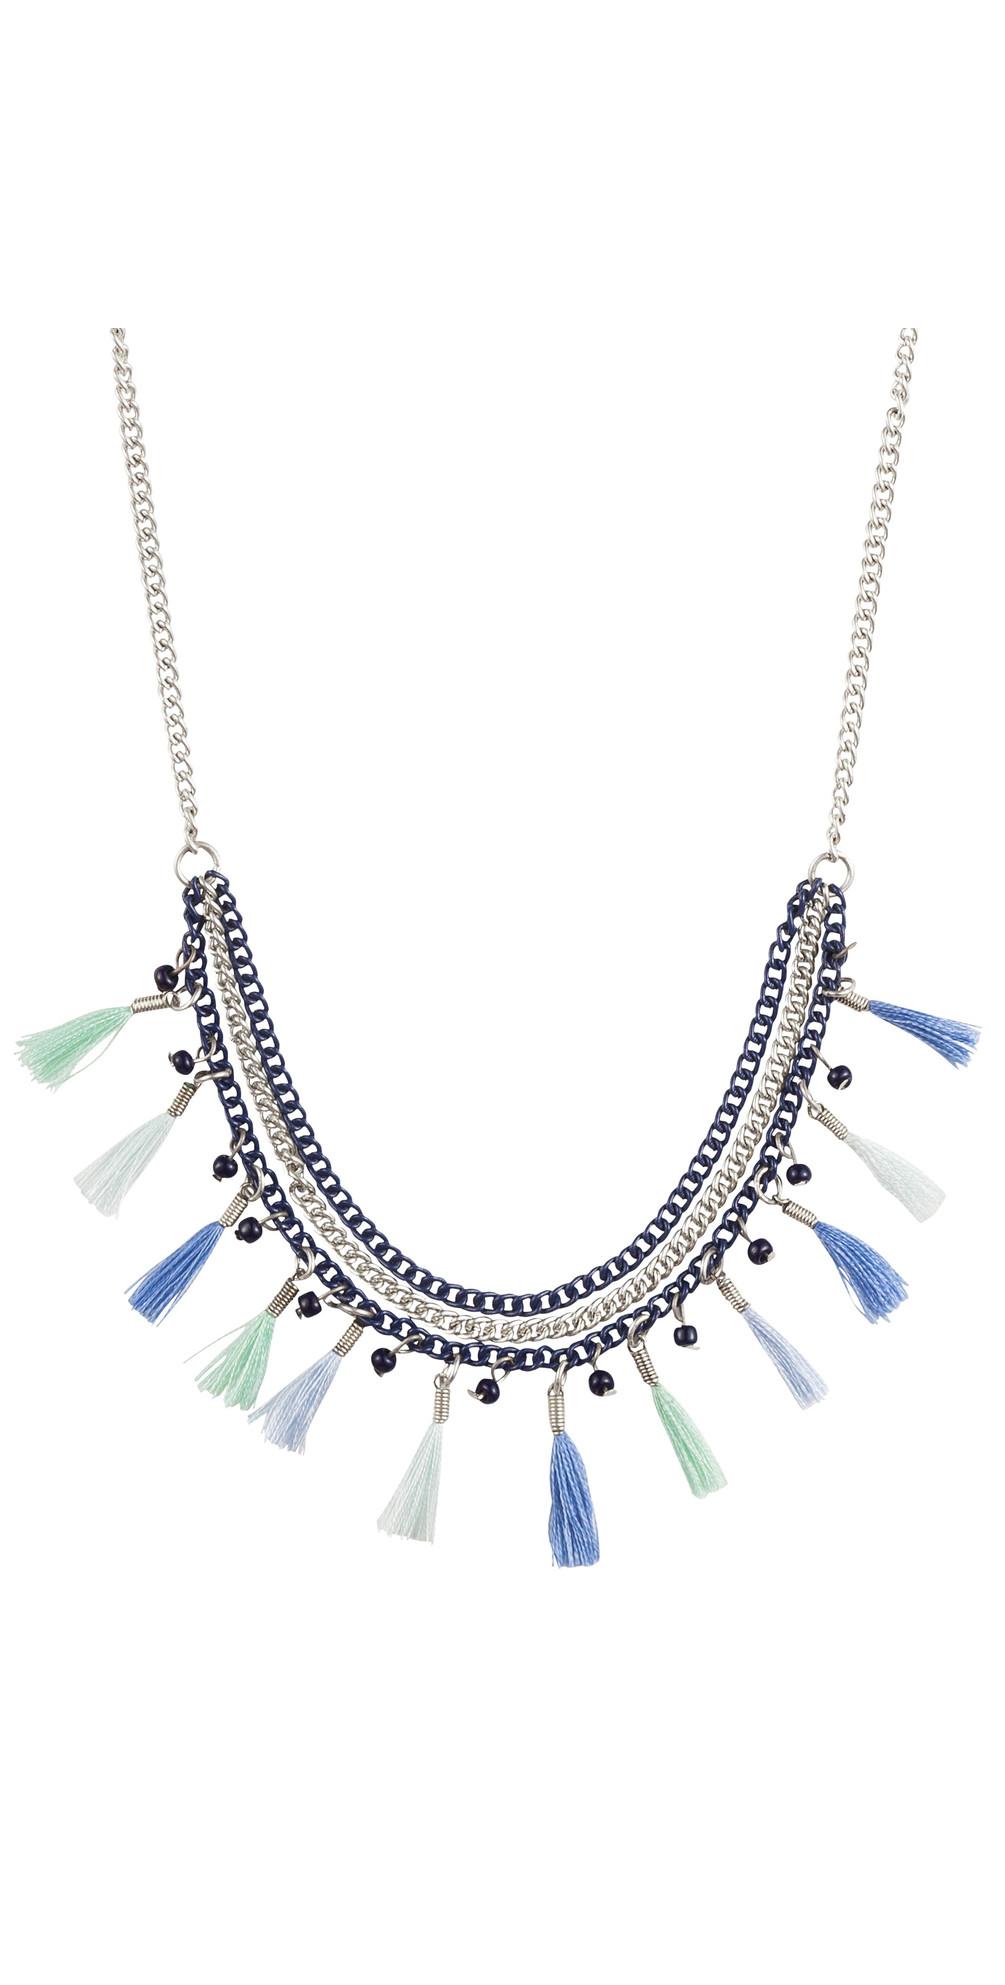 Tasselled Necklace main image